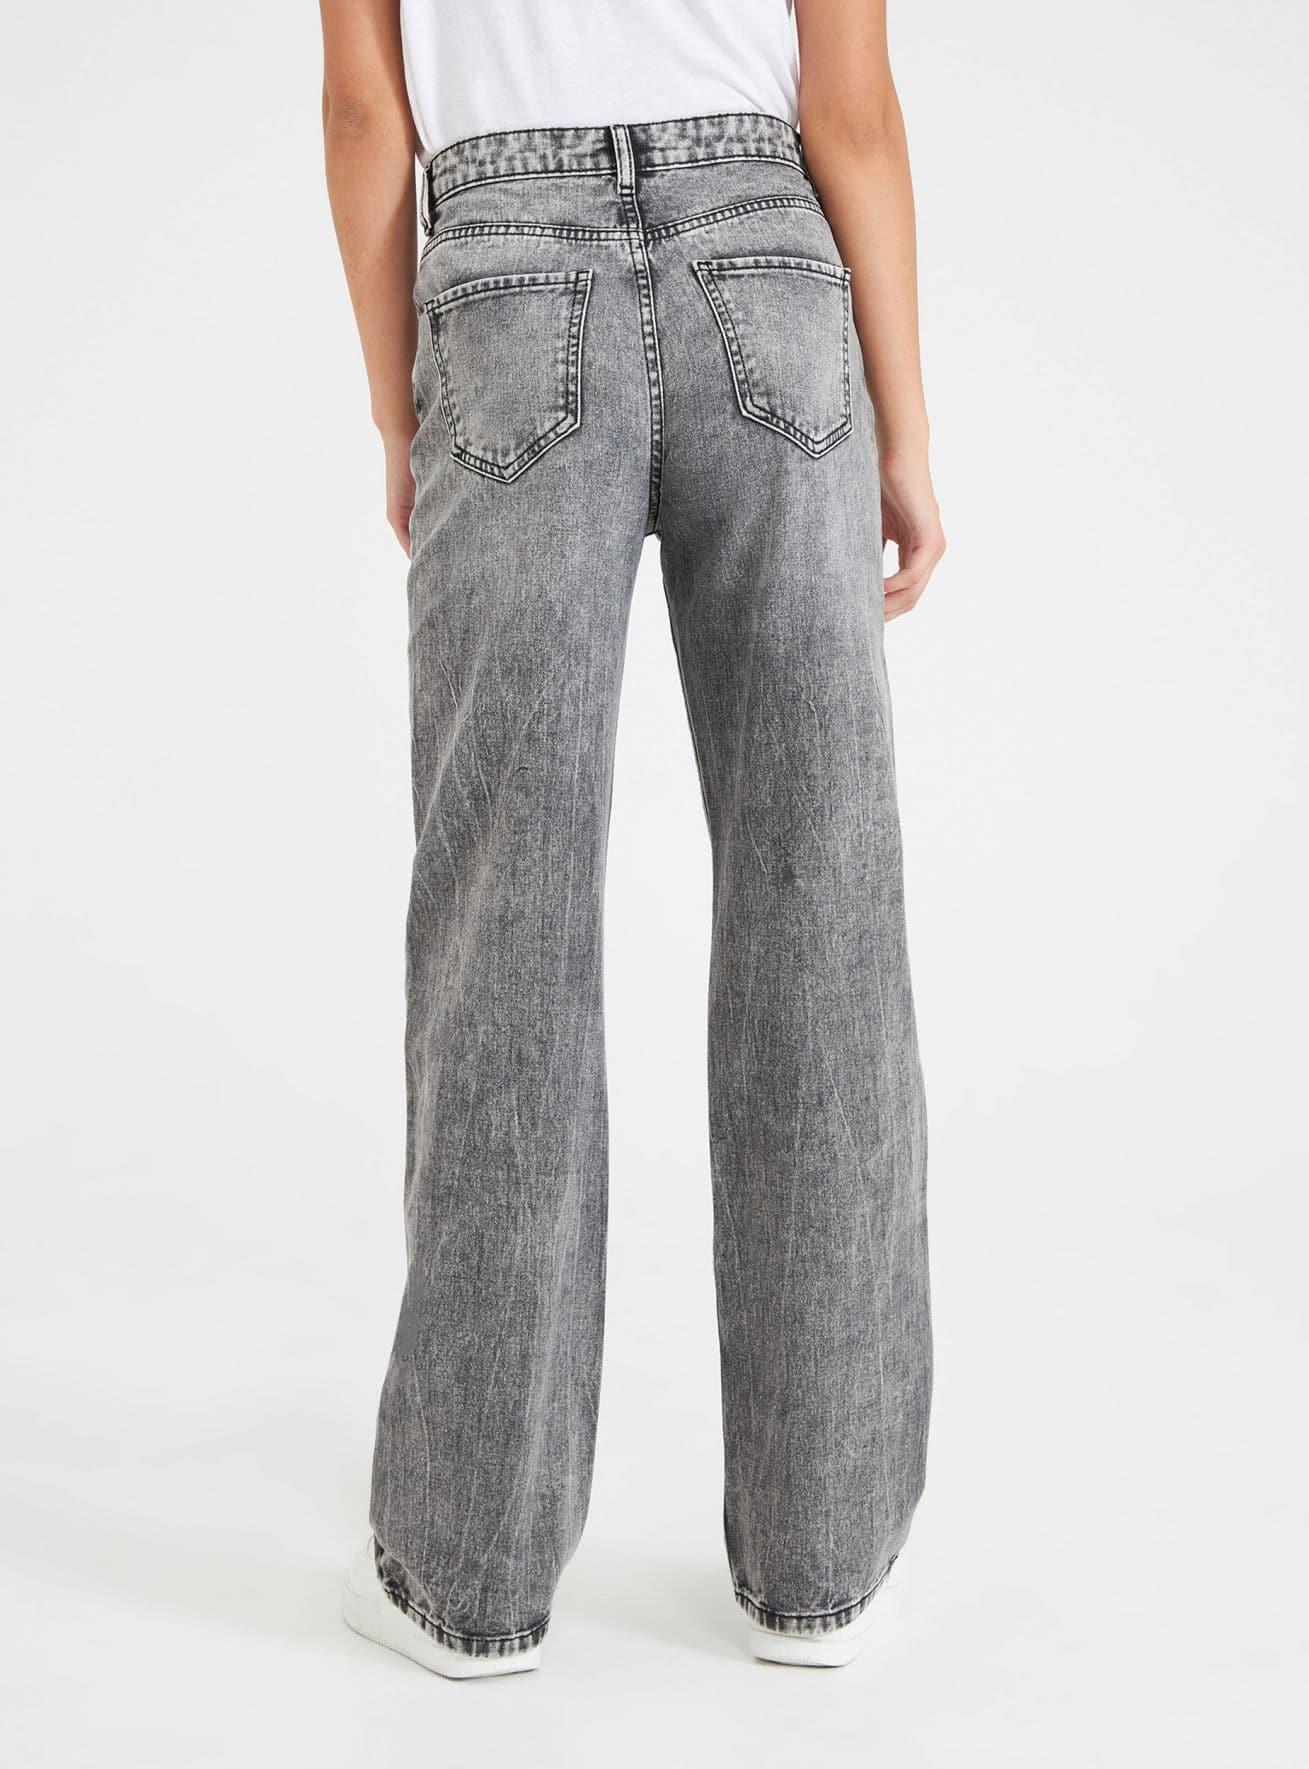 Pantalone Jeans Lungo Damen Terranova